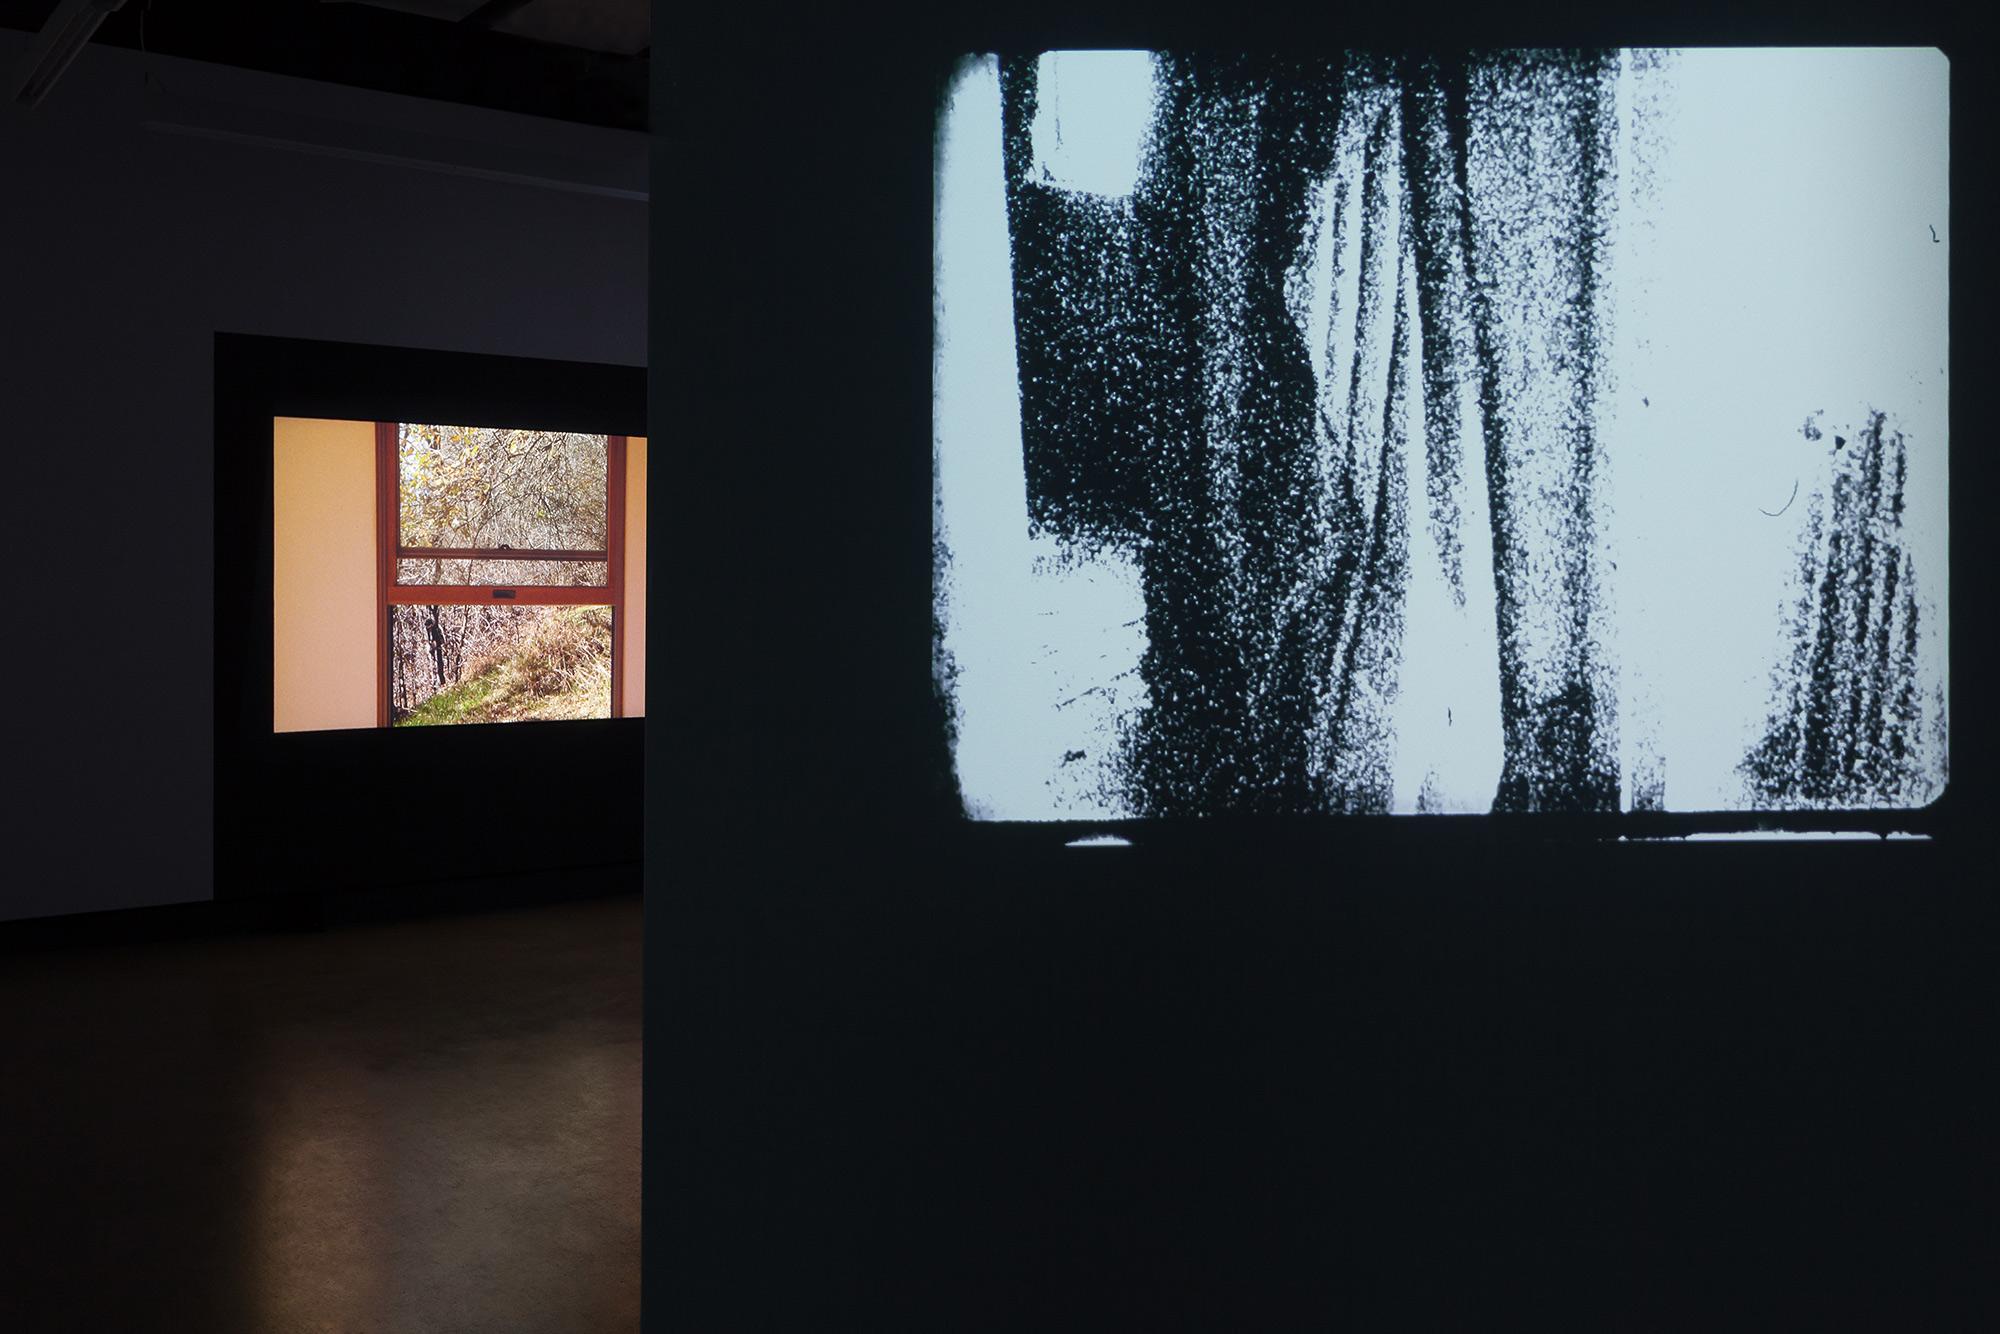 © Vue de l'exposition,  Ismaïl Bahri + James Benning + Ralitsa Doncheva + Miriam Sampaio  (2018). Photo : Marilou Crispin.